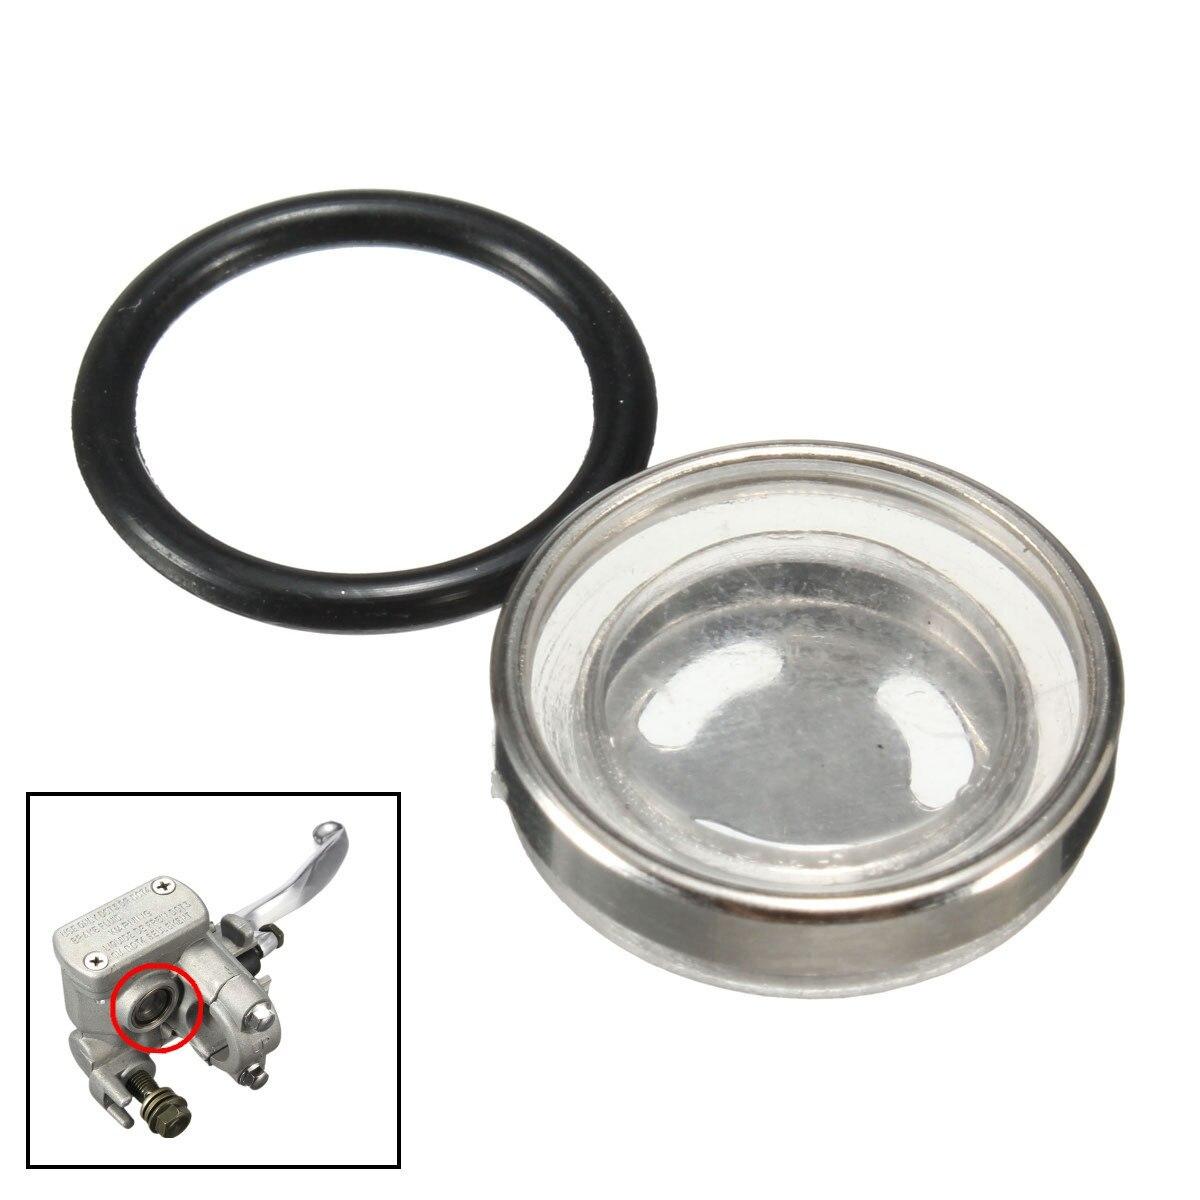 2pcs 18mm Motorcycle Master Brake Cylinder Reservoir Sight Glass with Rubber Gasket for Motorbike Brake Clutch Levers